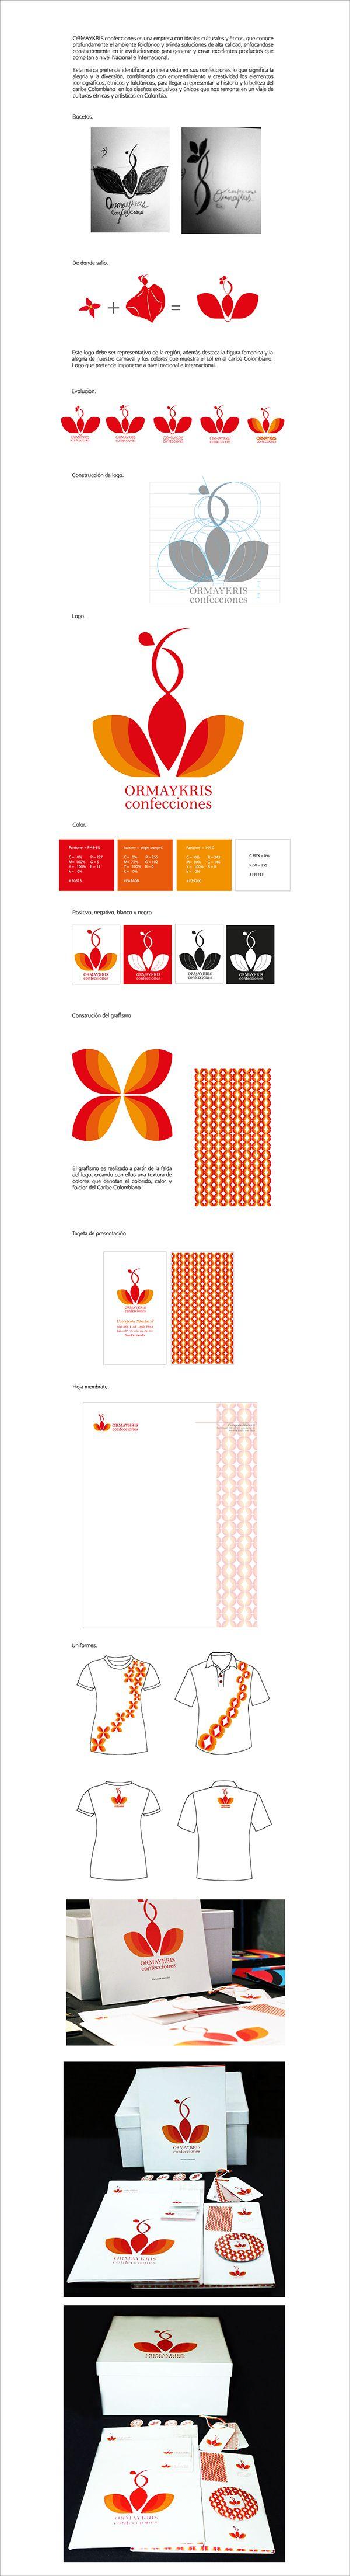 ORMAYKRIS confecciones on Behance #gale #utadeo_caribe #graphicdesign #design #logo